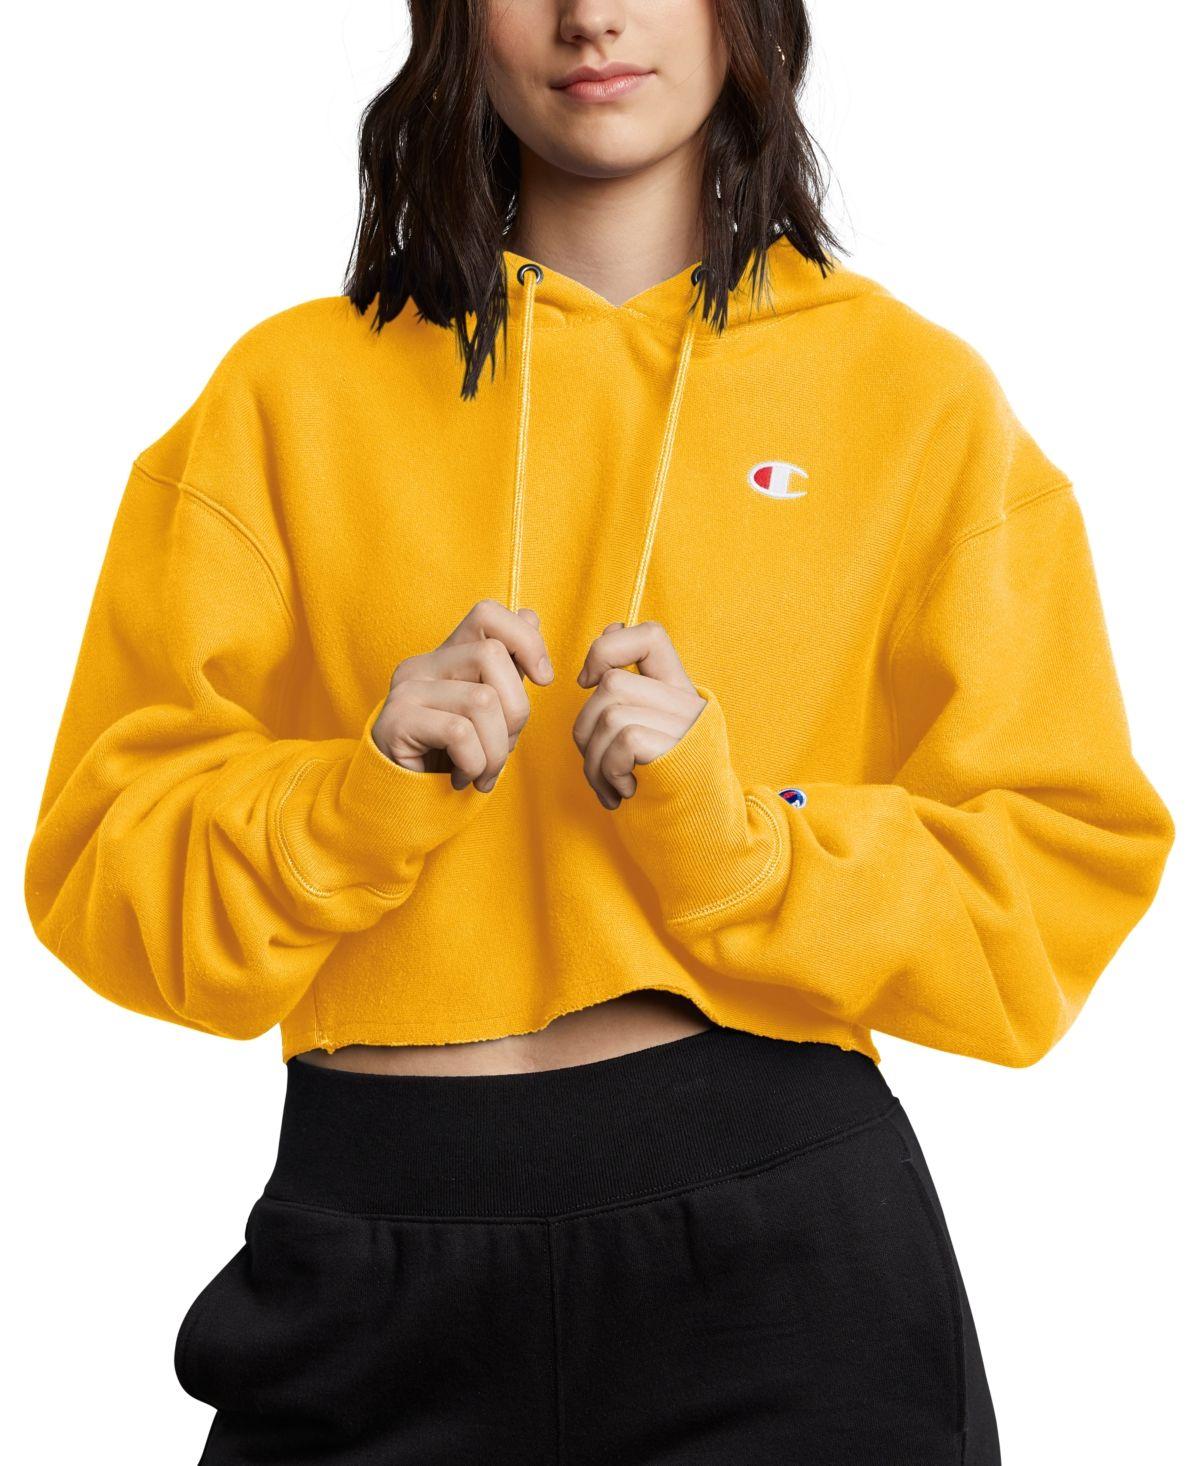 Champion Reverse Weave Cropped Hoodie Team Gold Cropped Hoodie Trendy Hoodies Cropped Hoodie Outfit [ 1466 x 1200 Pixel ]